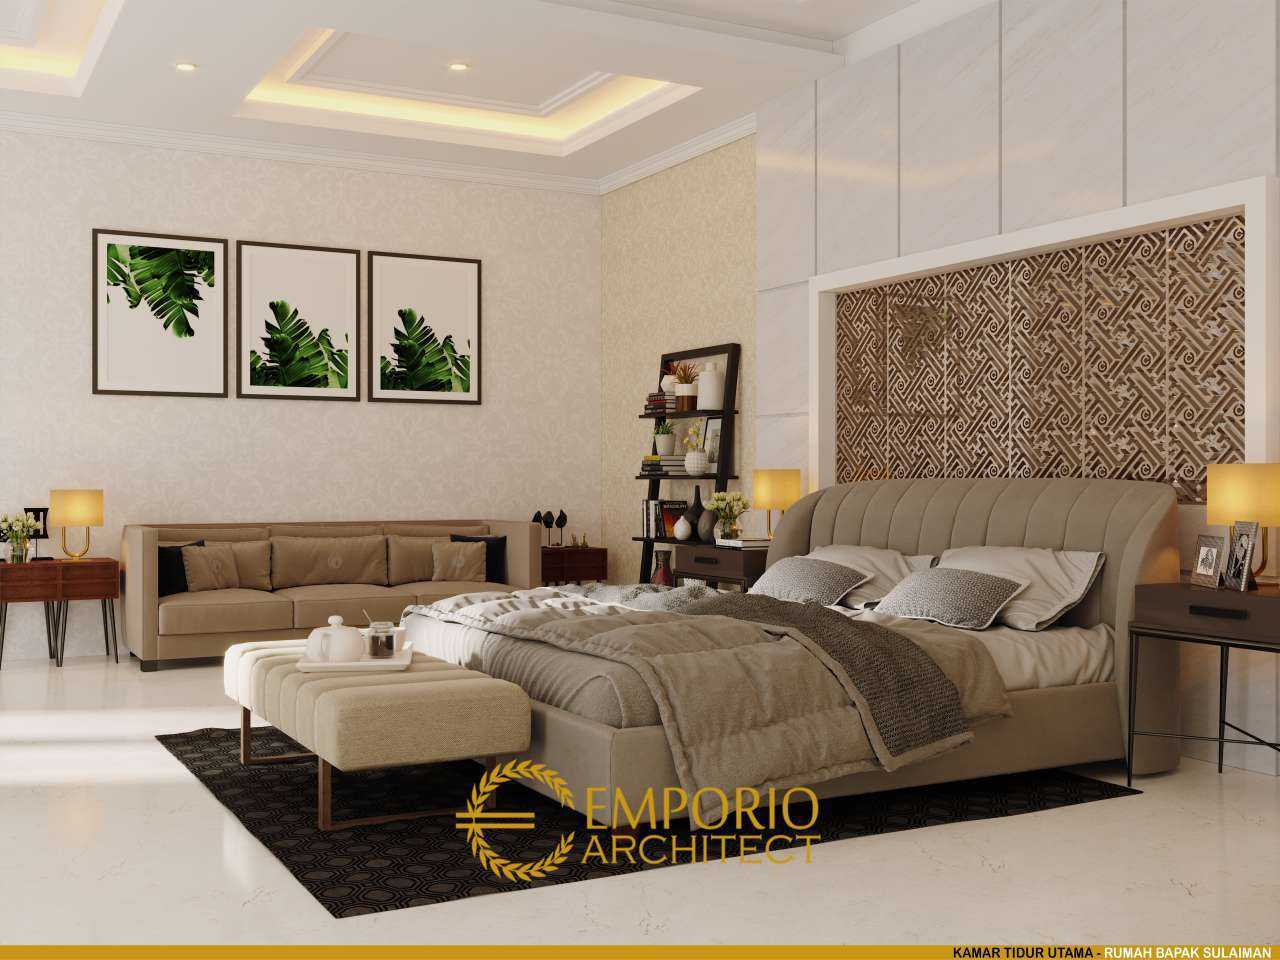 Emporio Architect Jasa Arsitek Bandung Desain Rumah Classic 3.5 Lantai 770 @ Bandung, Jawa Barat Bandung, Kota Bandung, Jawa Barat, Indonesia Bandung, Kota Bandung, Jawa Barat, Indonesia Emporio-Architect-Jasa-Arsitek-Bandung-Desain-Rumah-Classic-35-Lantai-770-Bandung-Jawa-Barat   94537